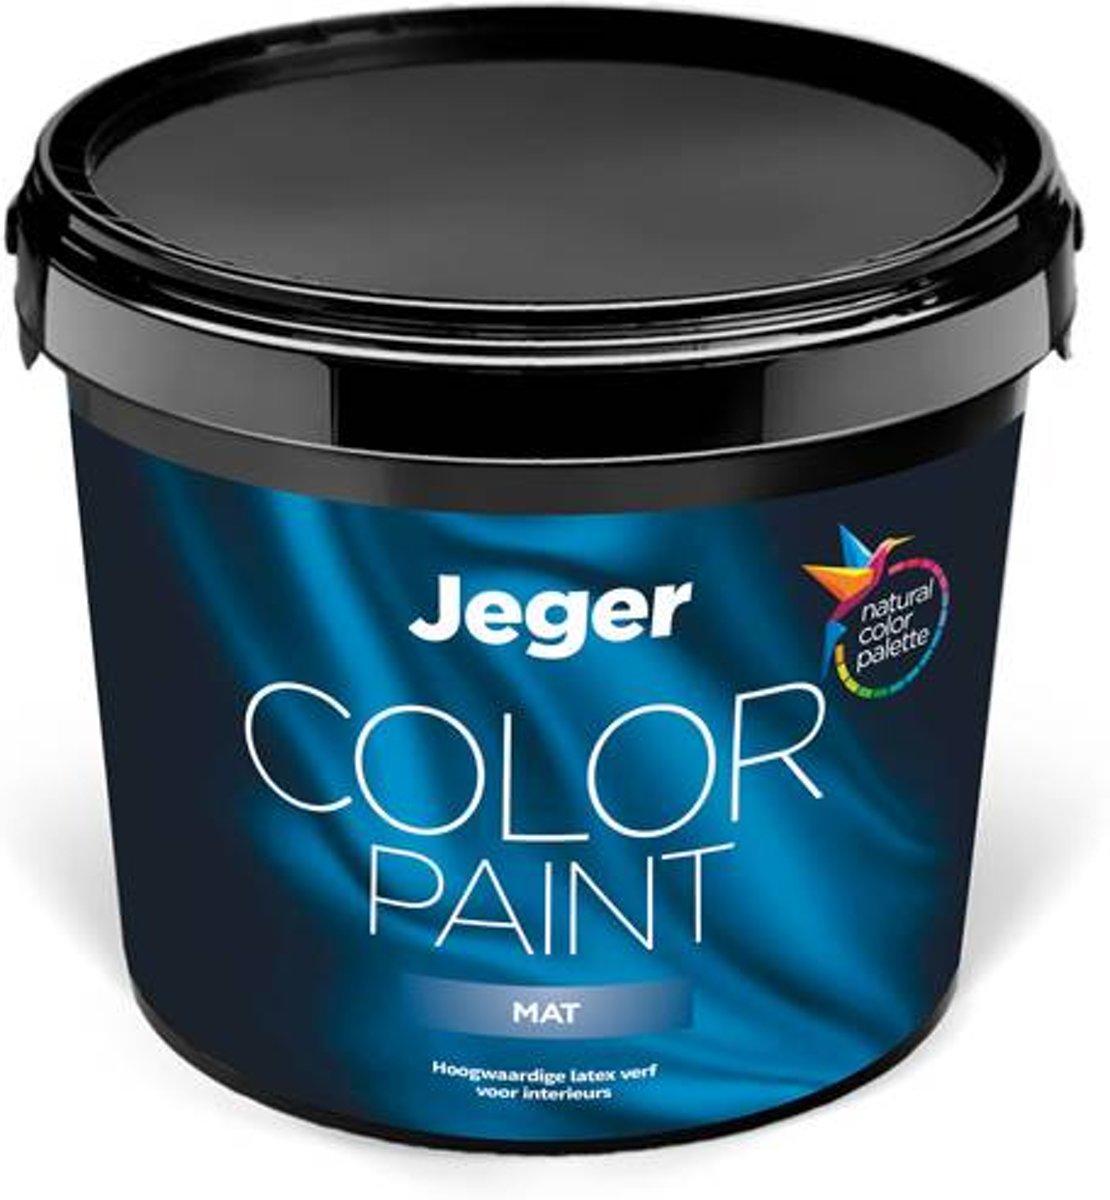 Jeger muurverf Mat voor binnen | 5 liter | Kleur Mintturquoise (RAL 6033) Mintturquoise - 5L